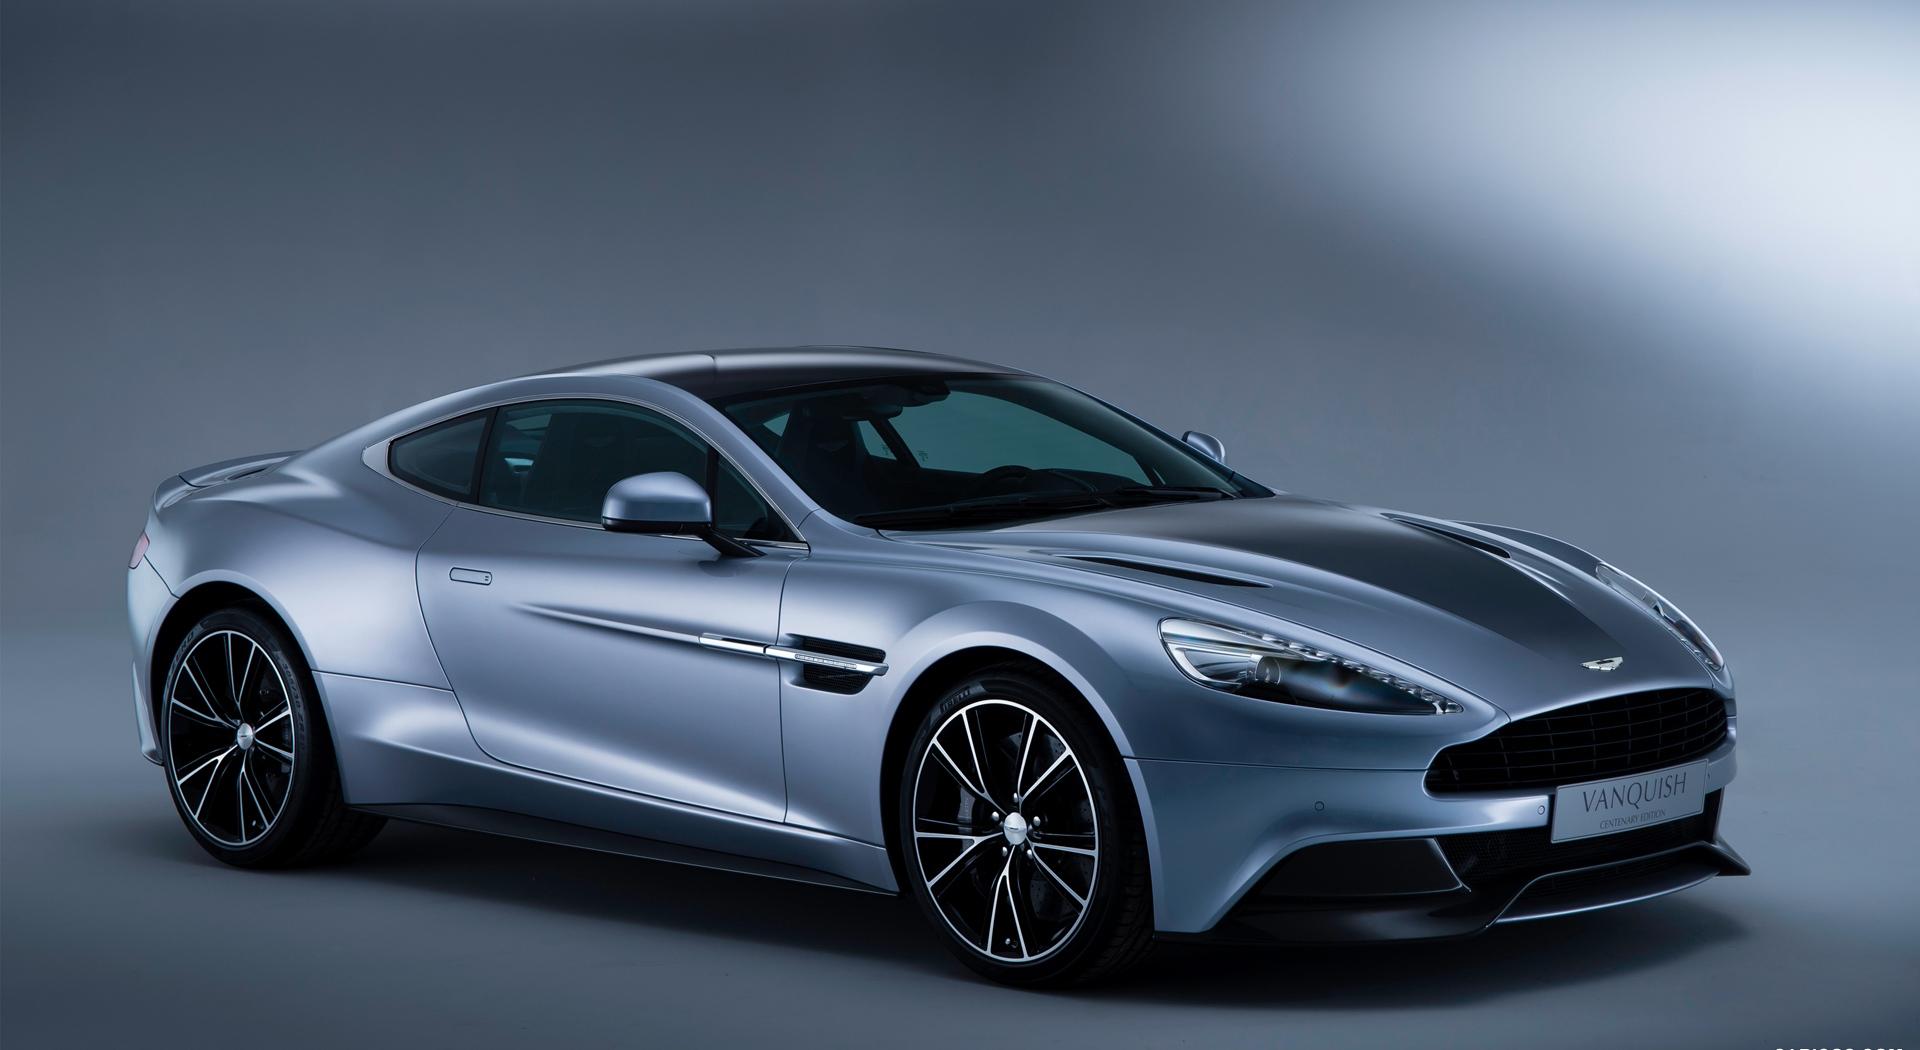 Aston Martin Vanquish front